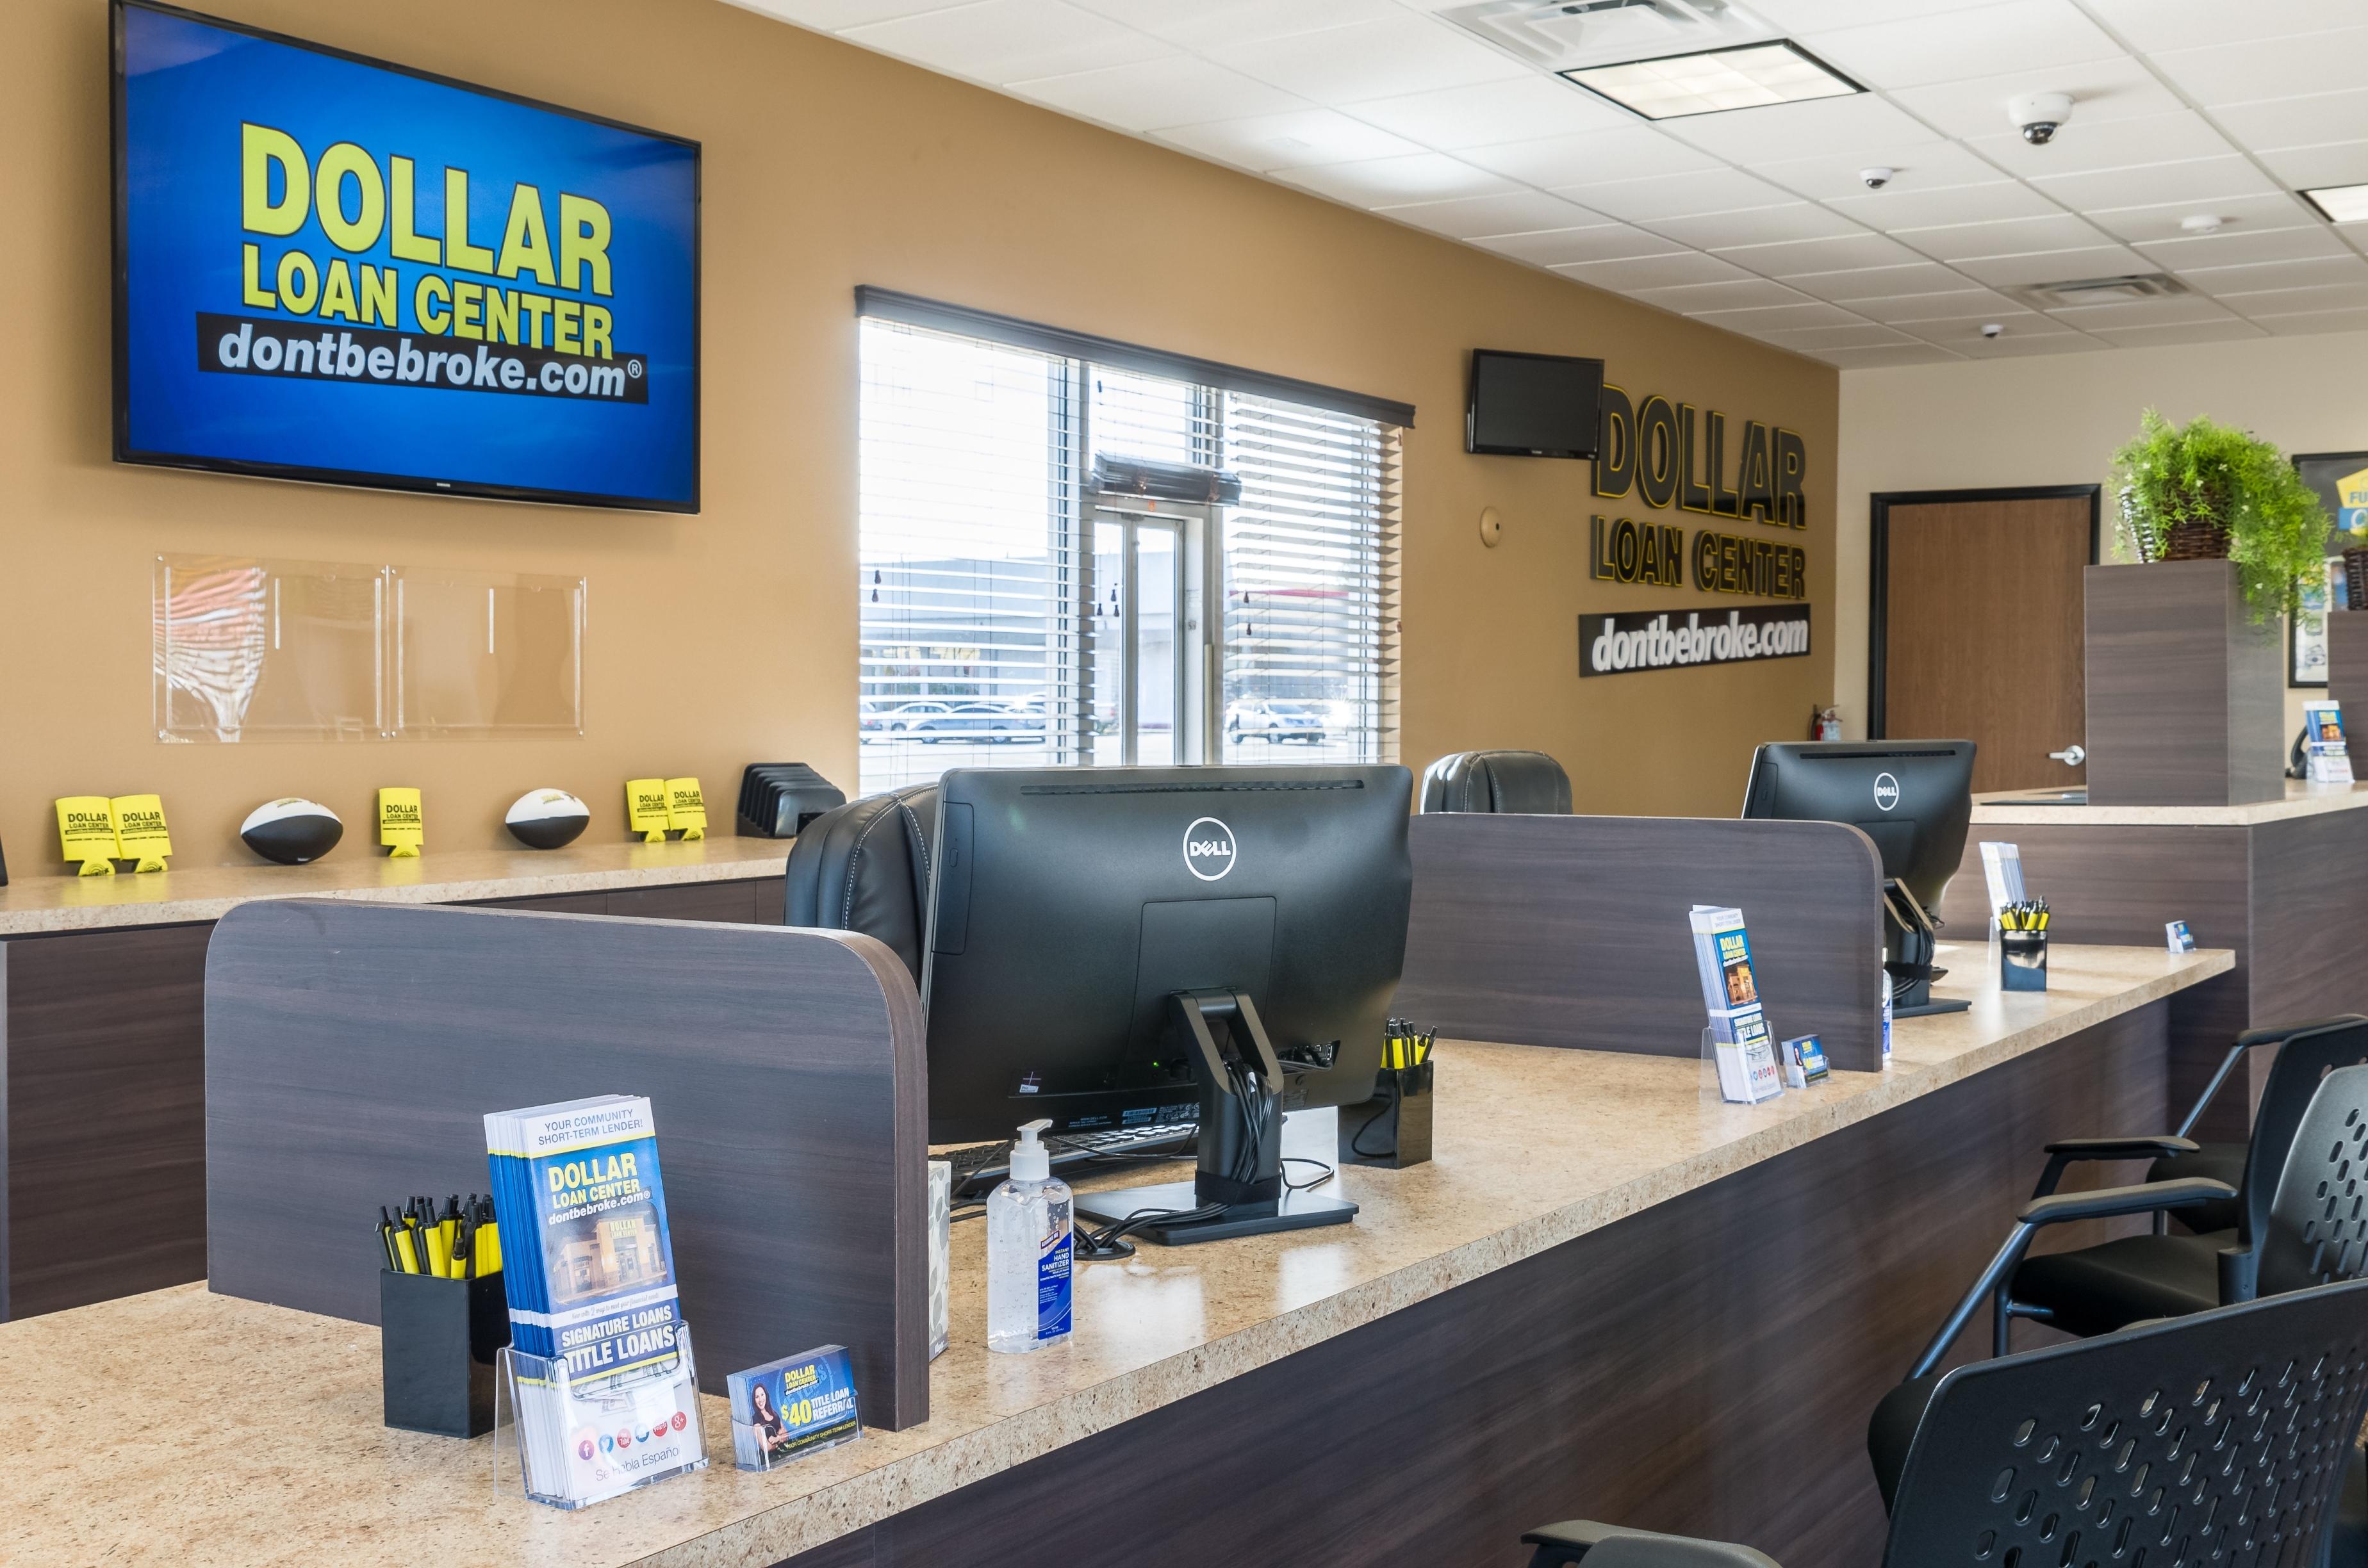 Dollar Loan Center - ad image